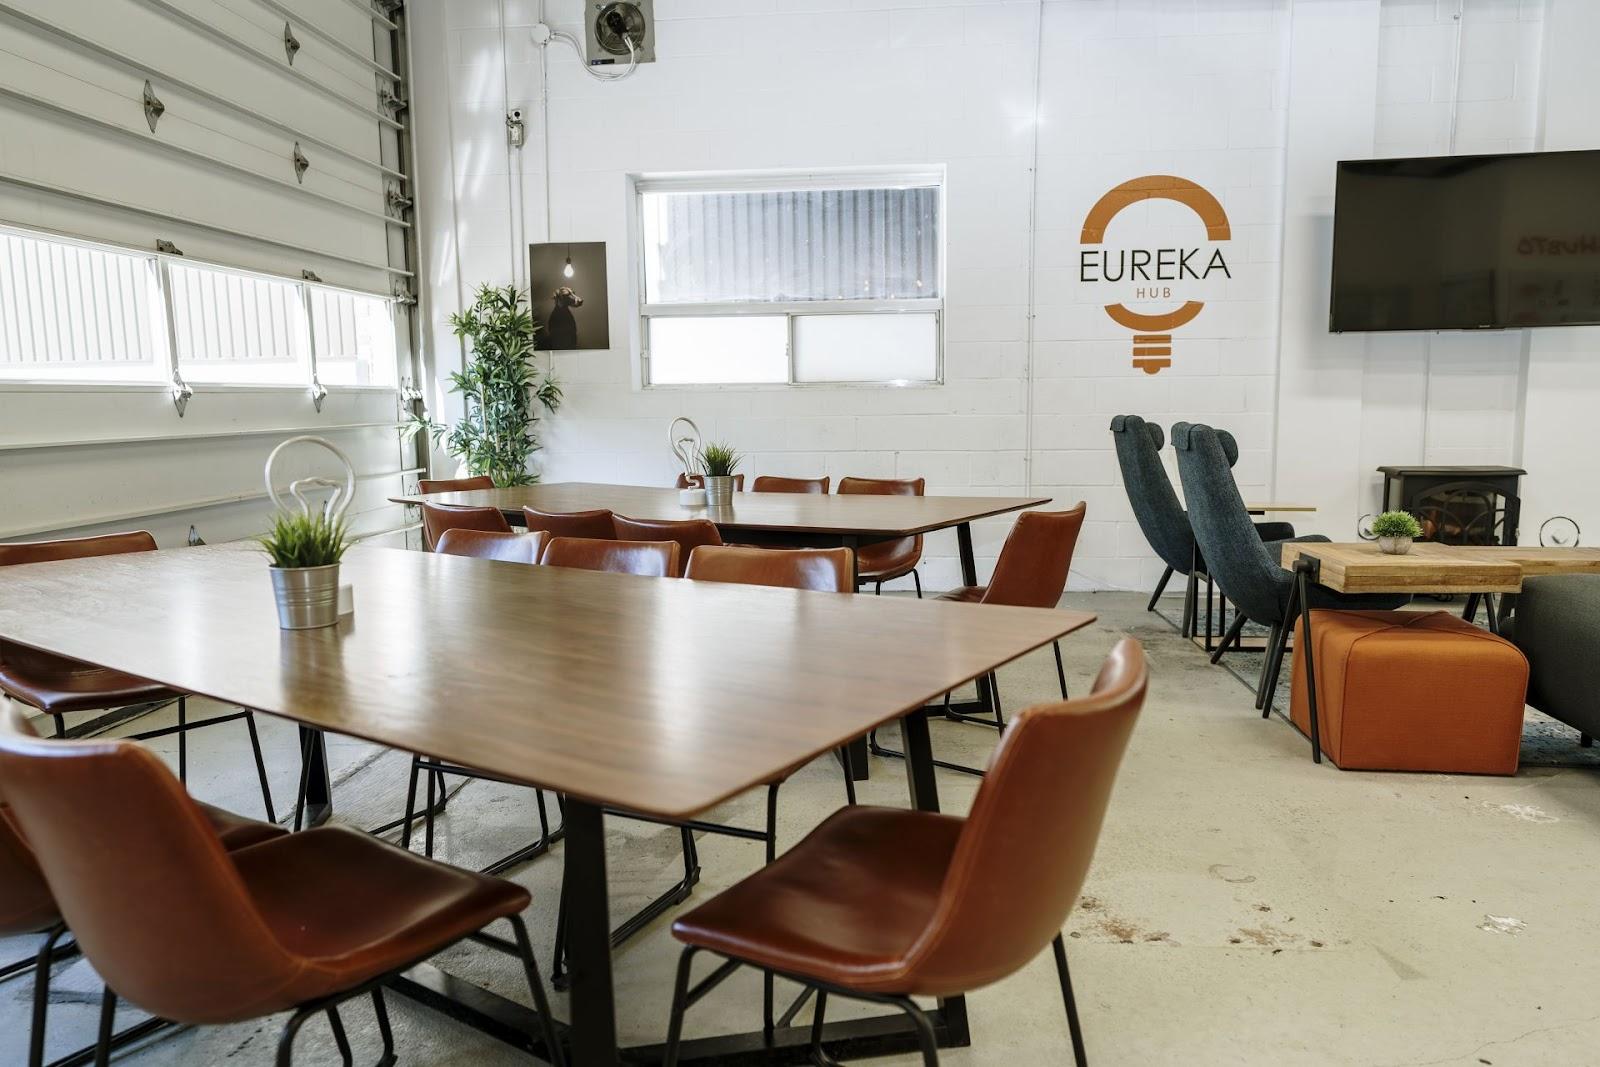 Eureka Hub Coworking Space in Toronto